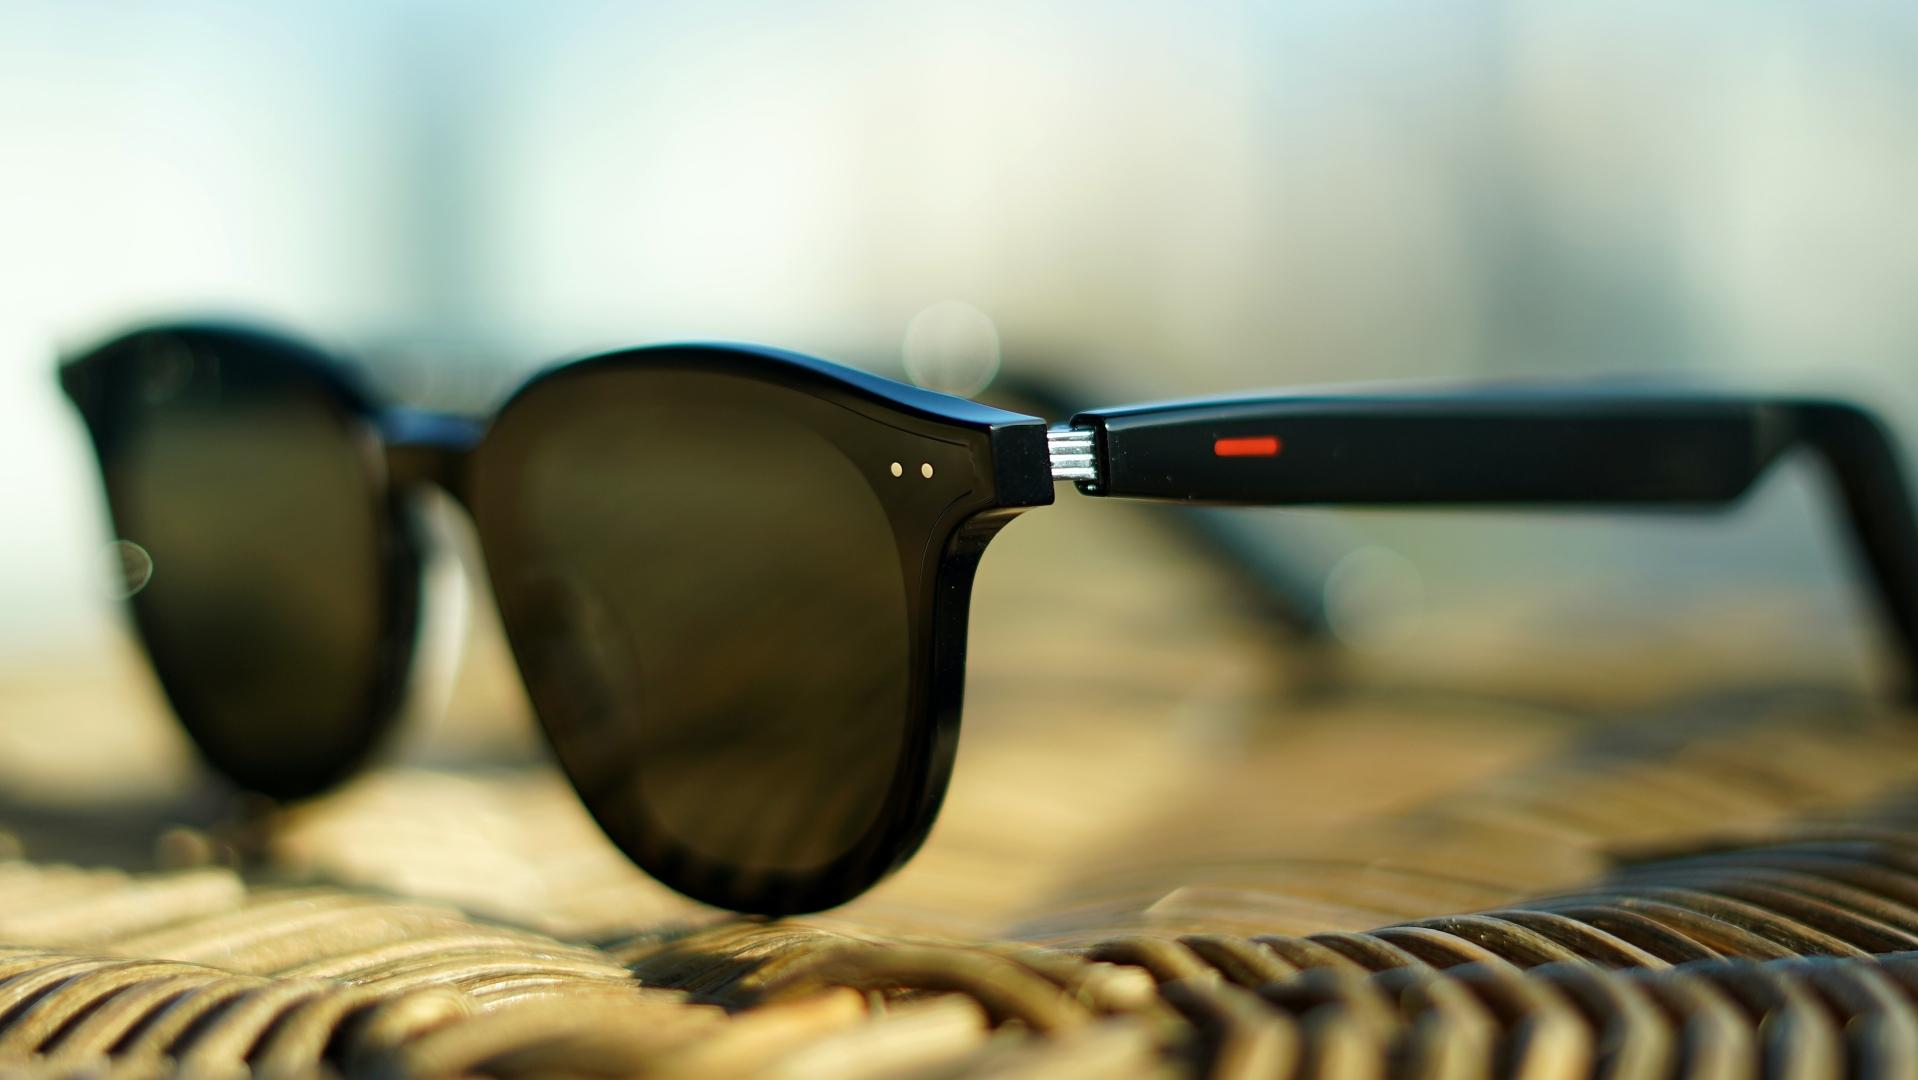 Bok okularów Huawei X Gentle Monster Eyewear II